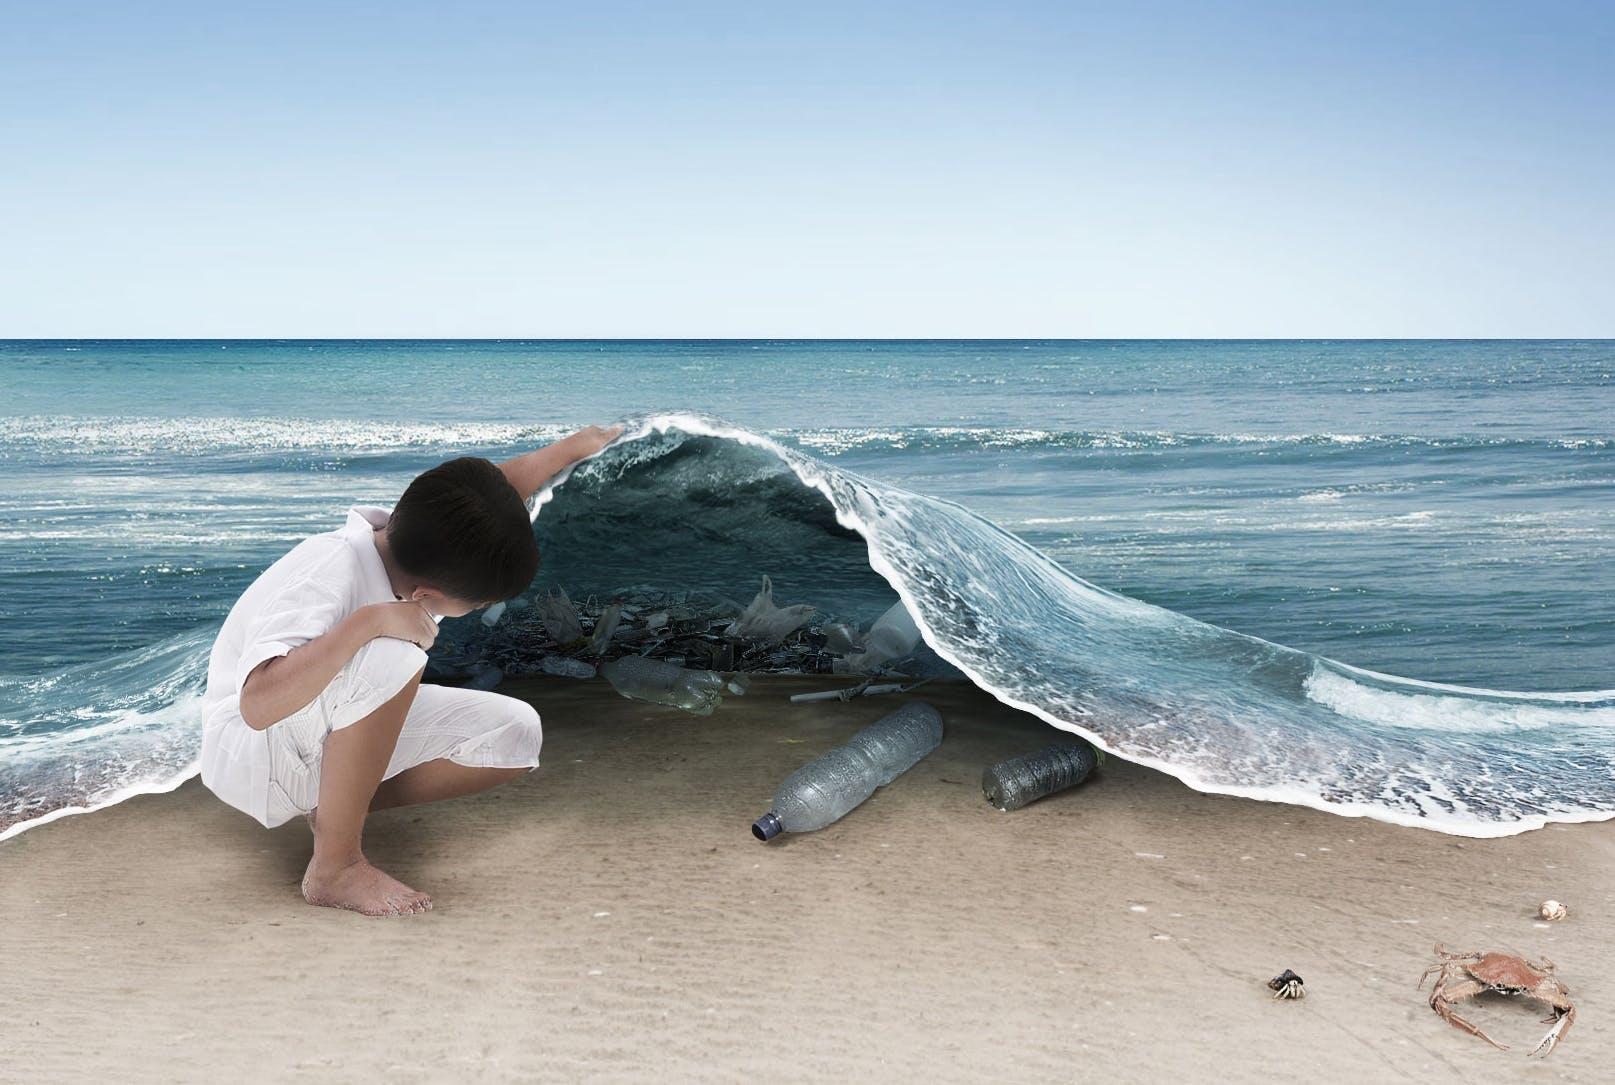 miljø forurening design